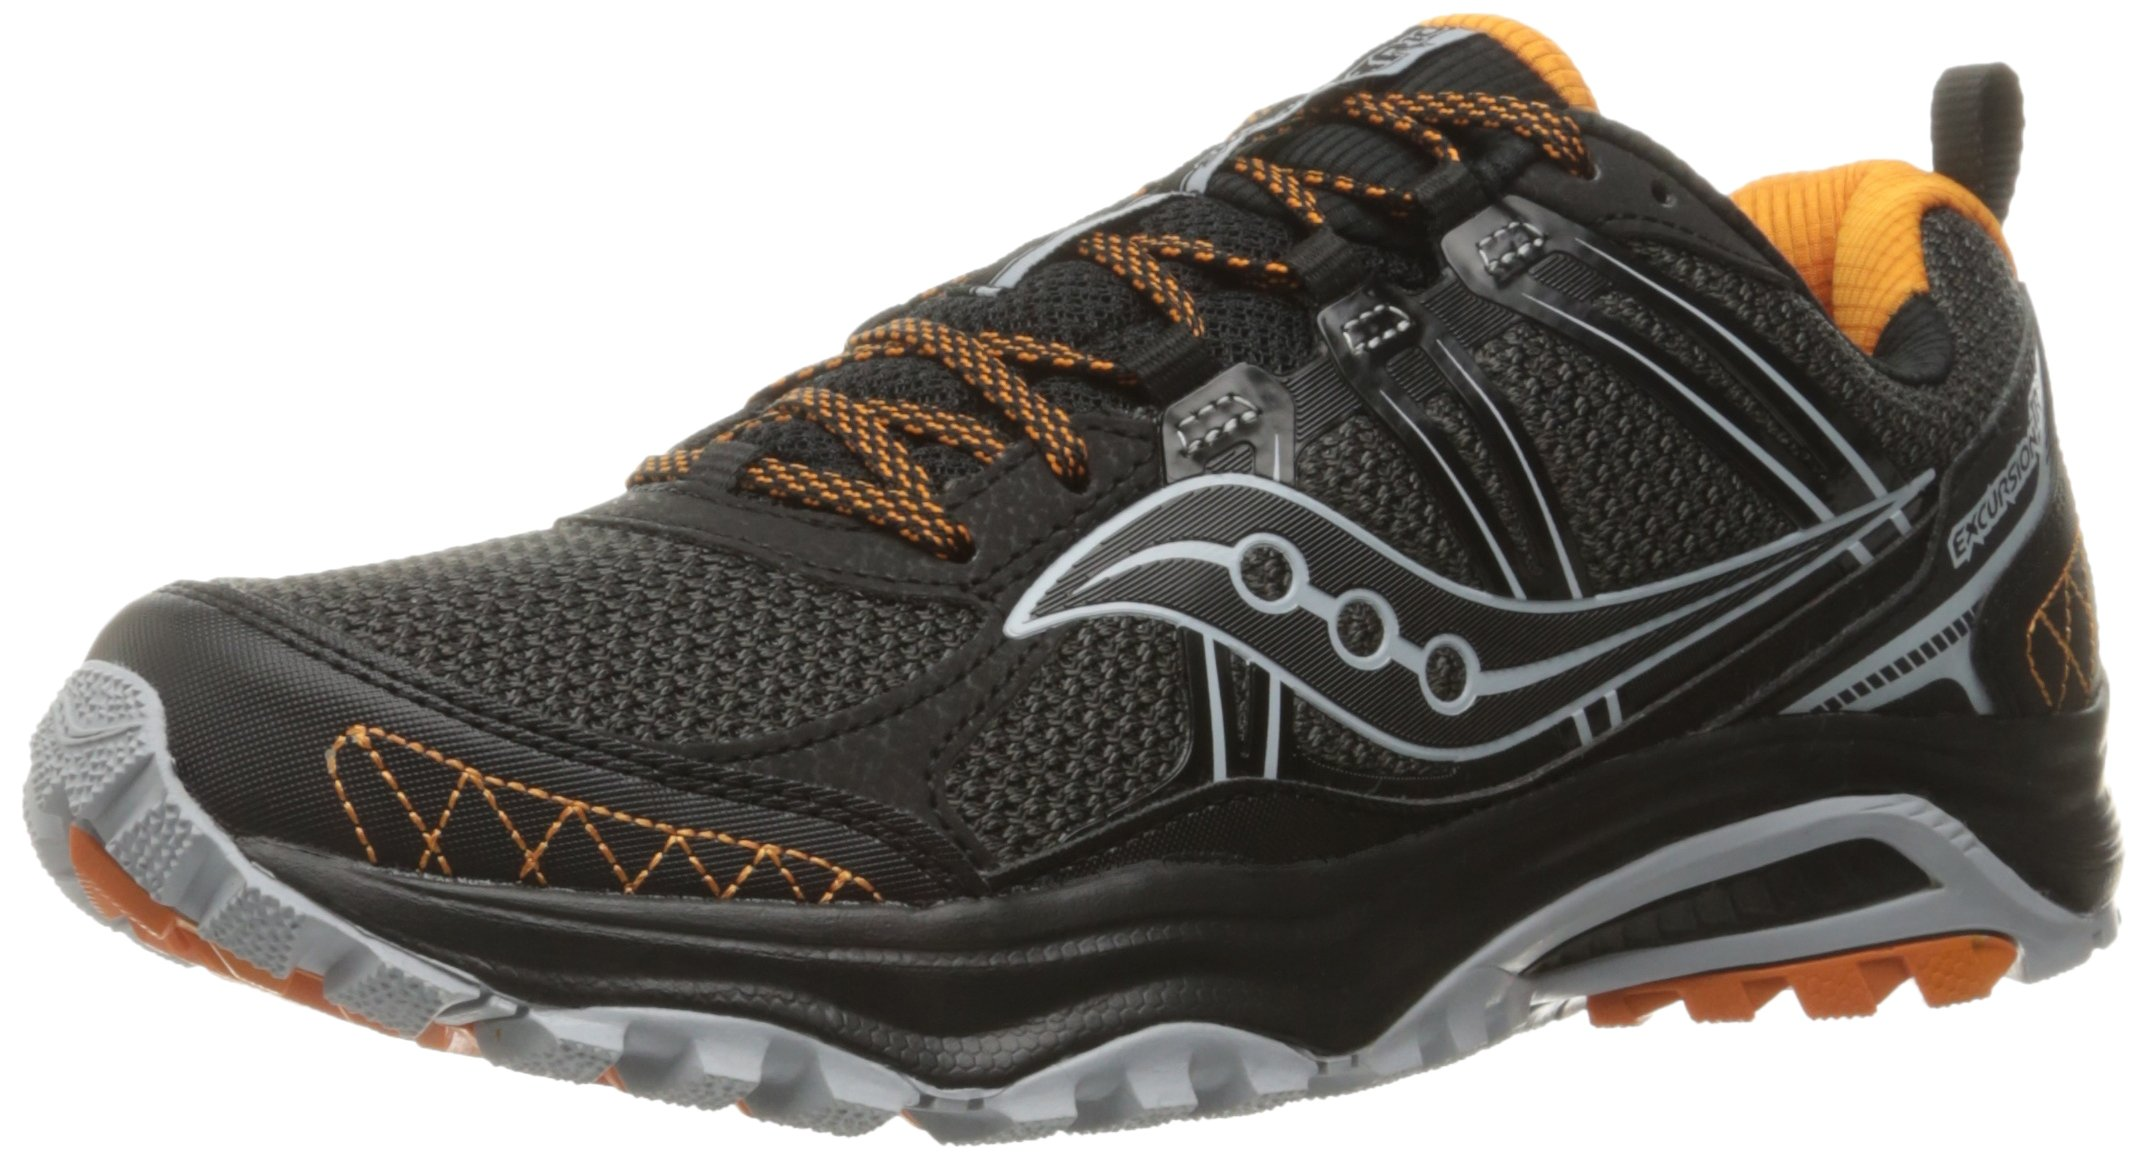 Saucony Men's Grid Excursion tr10 Trail Runner Grey/Black/Orange 8 M US